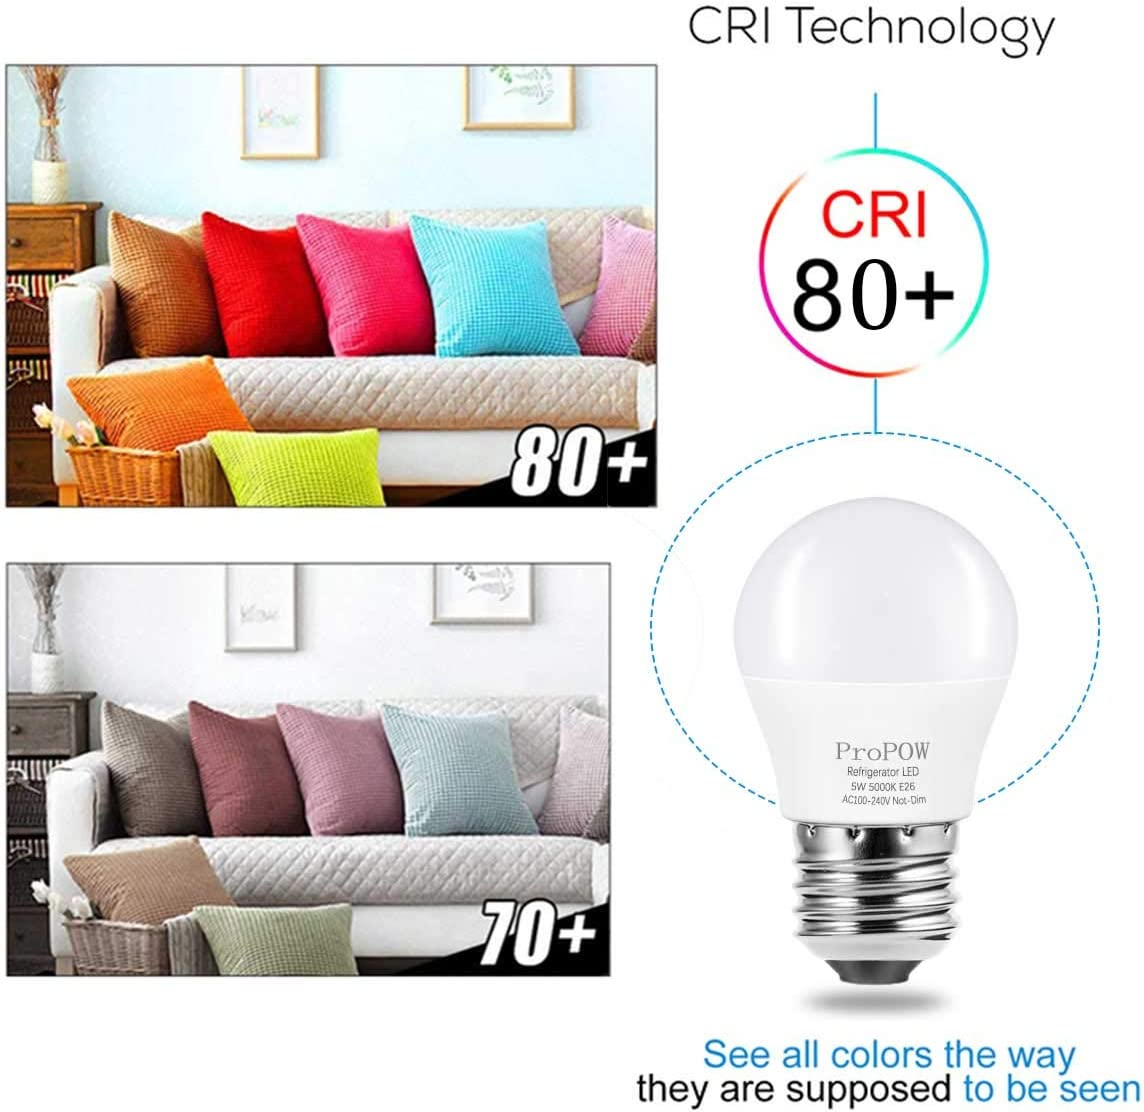 LED Refrigerator Light Bulb, ProPOW 40W Equivalent 120V A15 Fridge Bulbs 5 Watt Daylight White 5000K E26 Medium Base, Energy Saving Freezer Ceiling Home Lighting, Not-Dim, Waterproof, 2 Pack